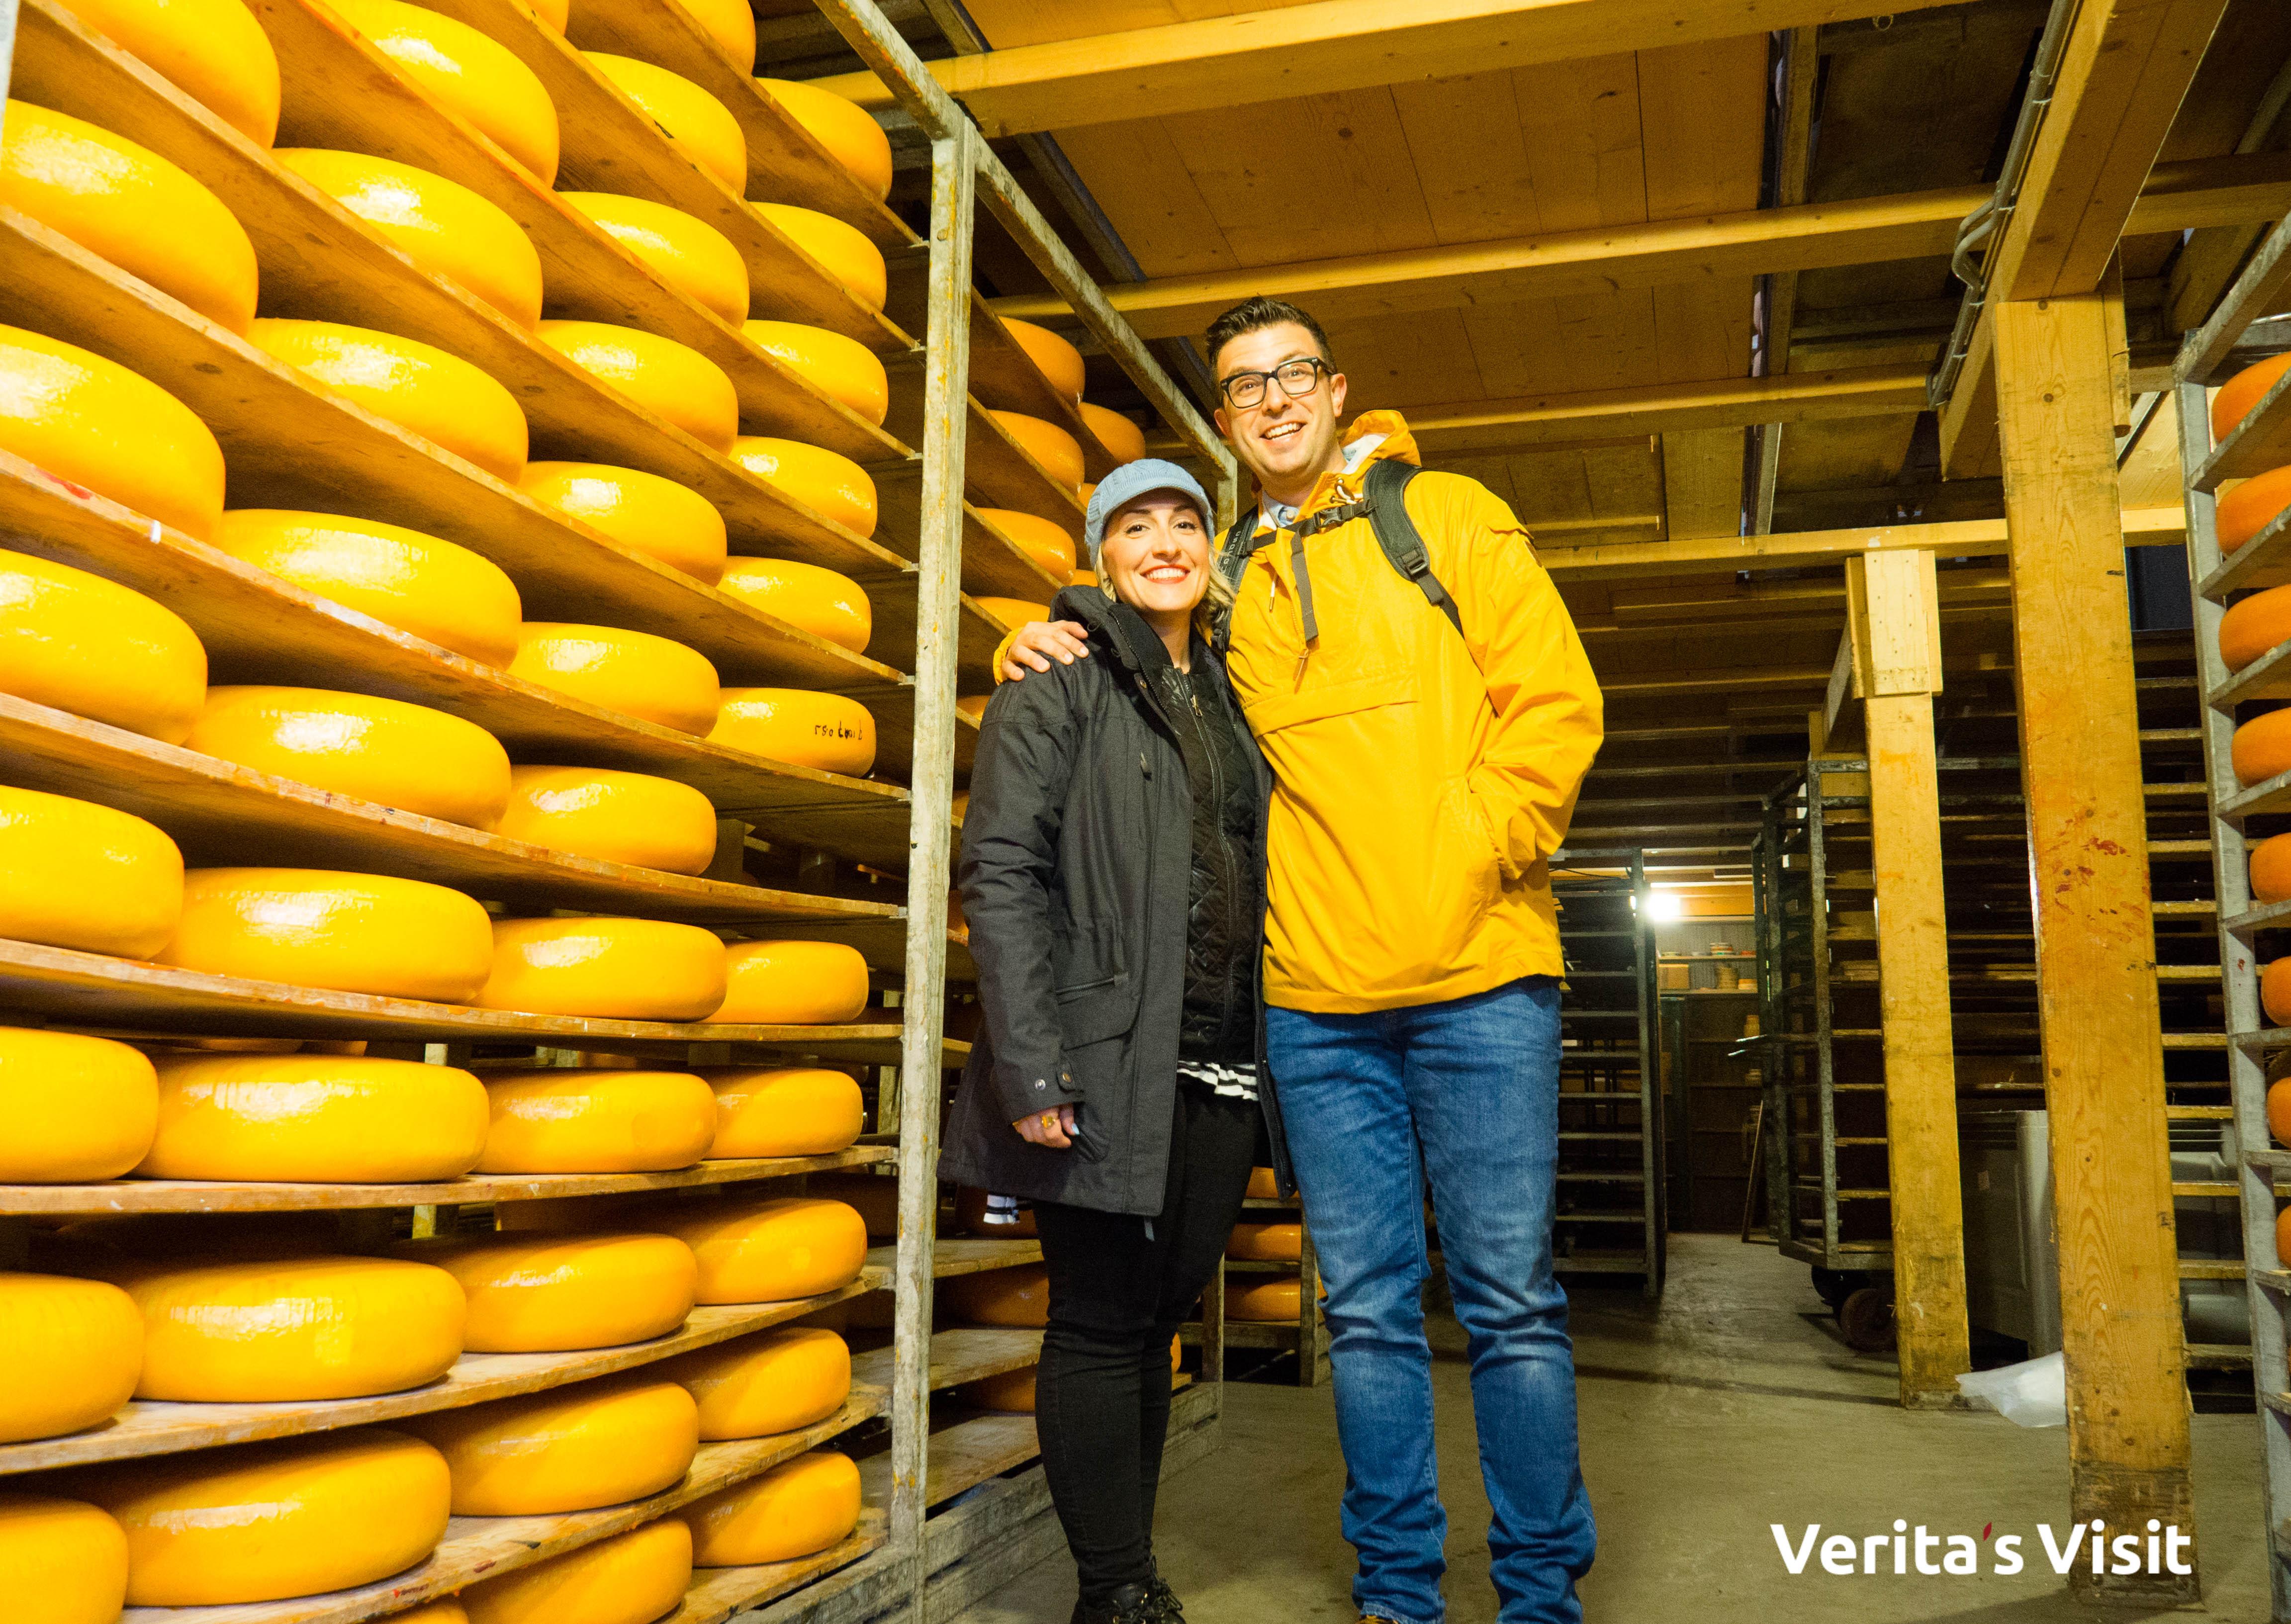 cheese farm visit Verita's kaasboerderij rondleiding activiteit